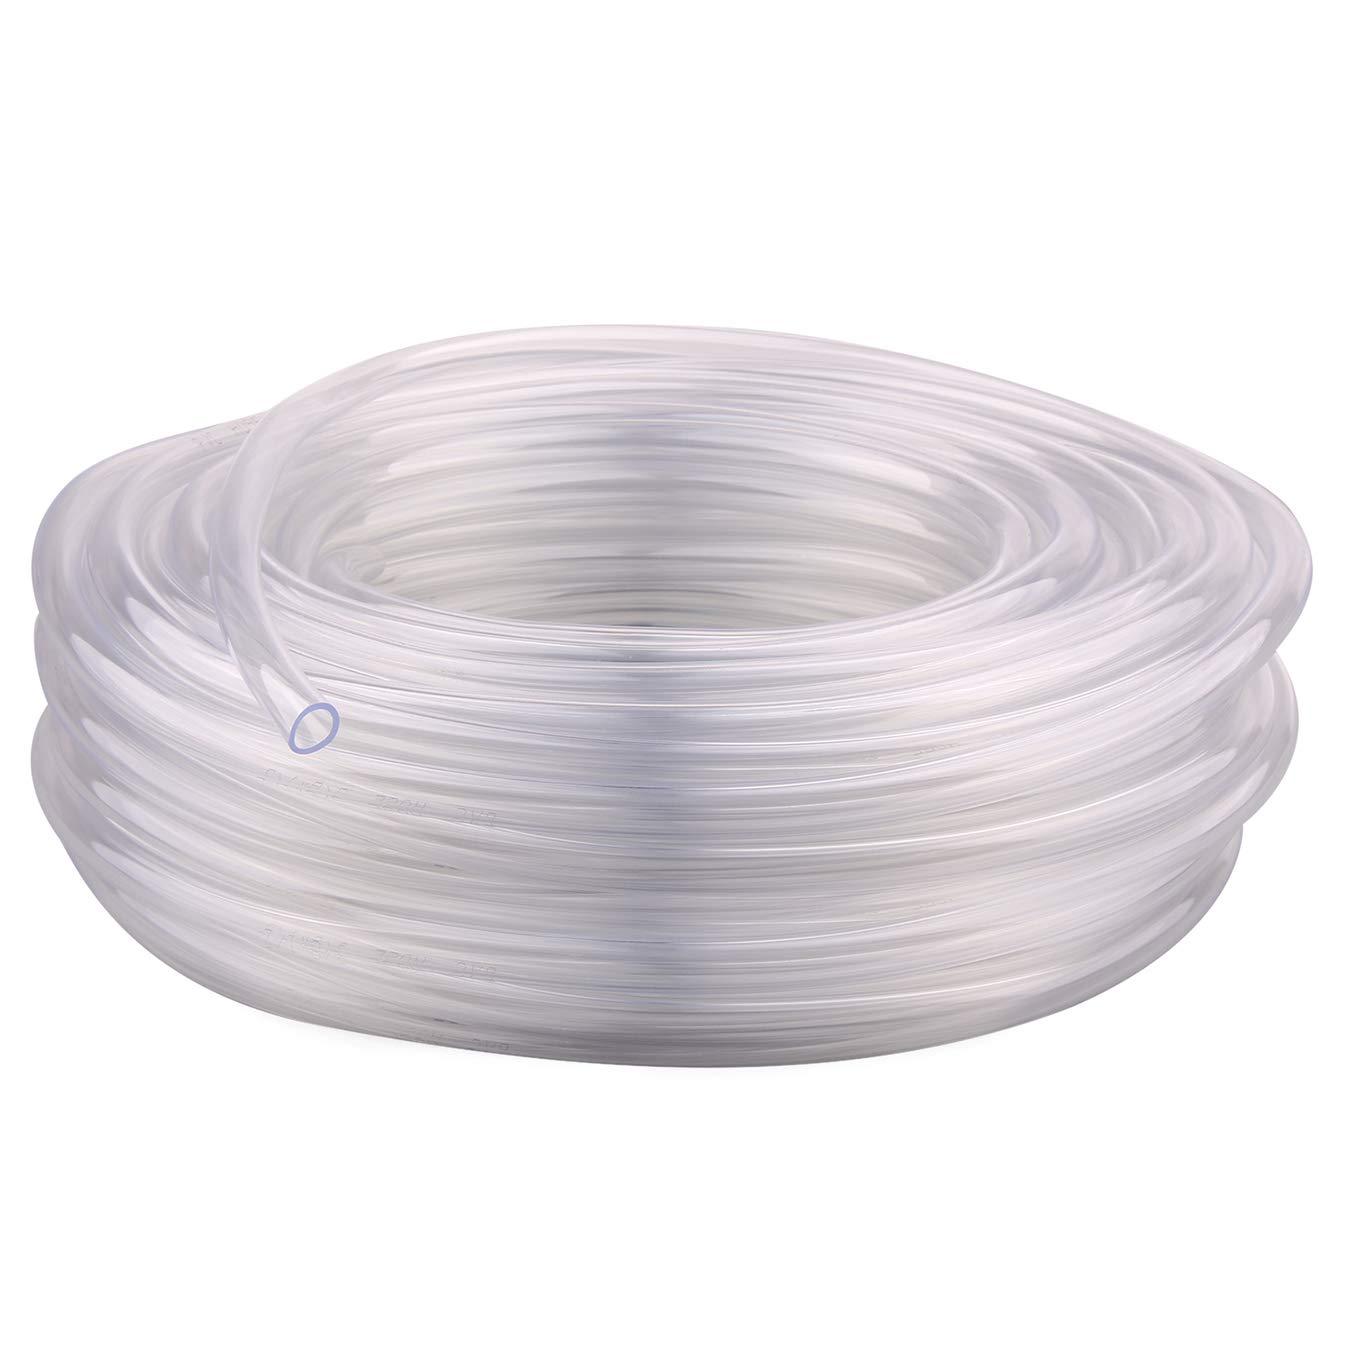 Tuyau en PVC et silicone